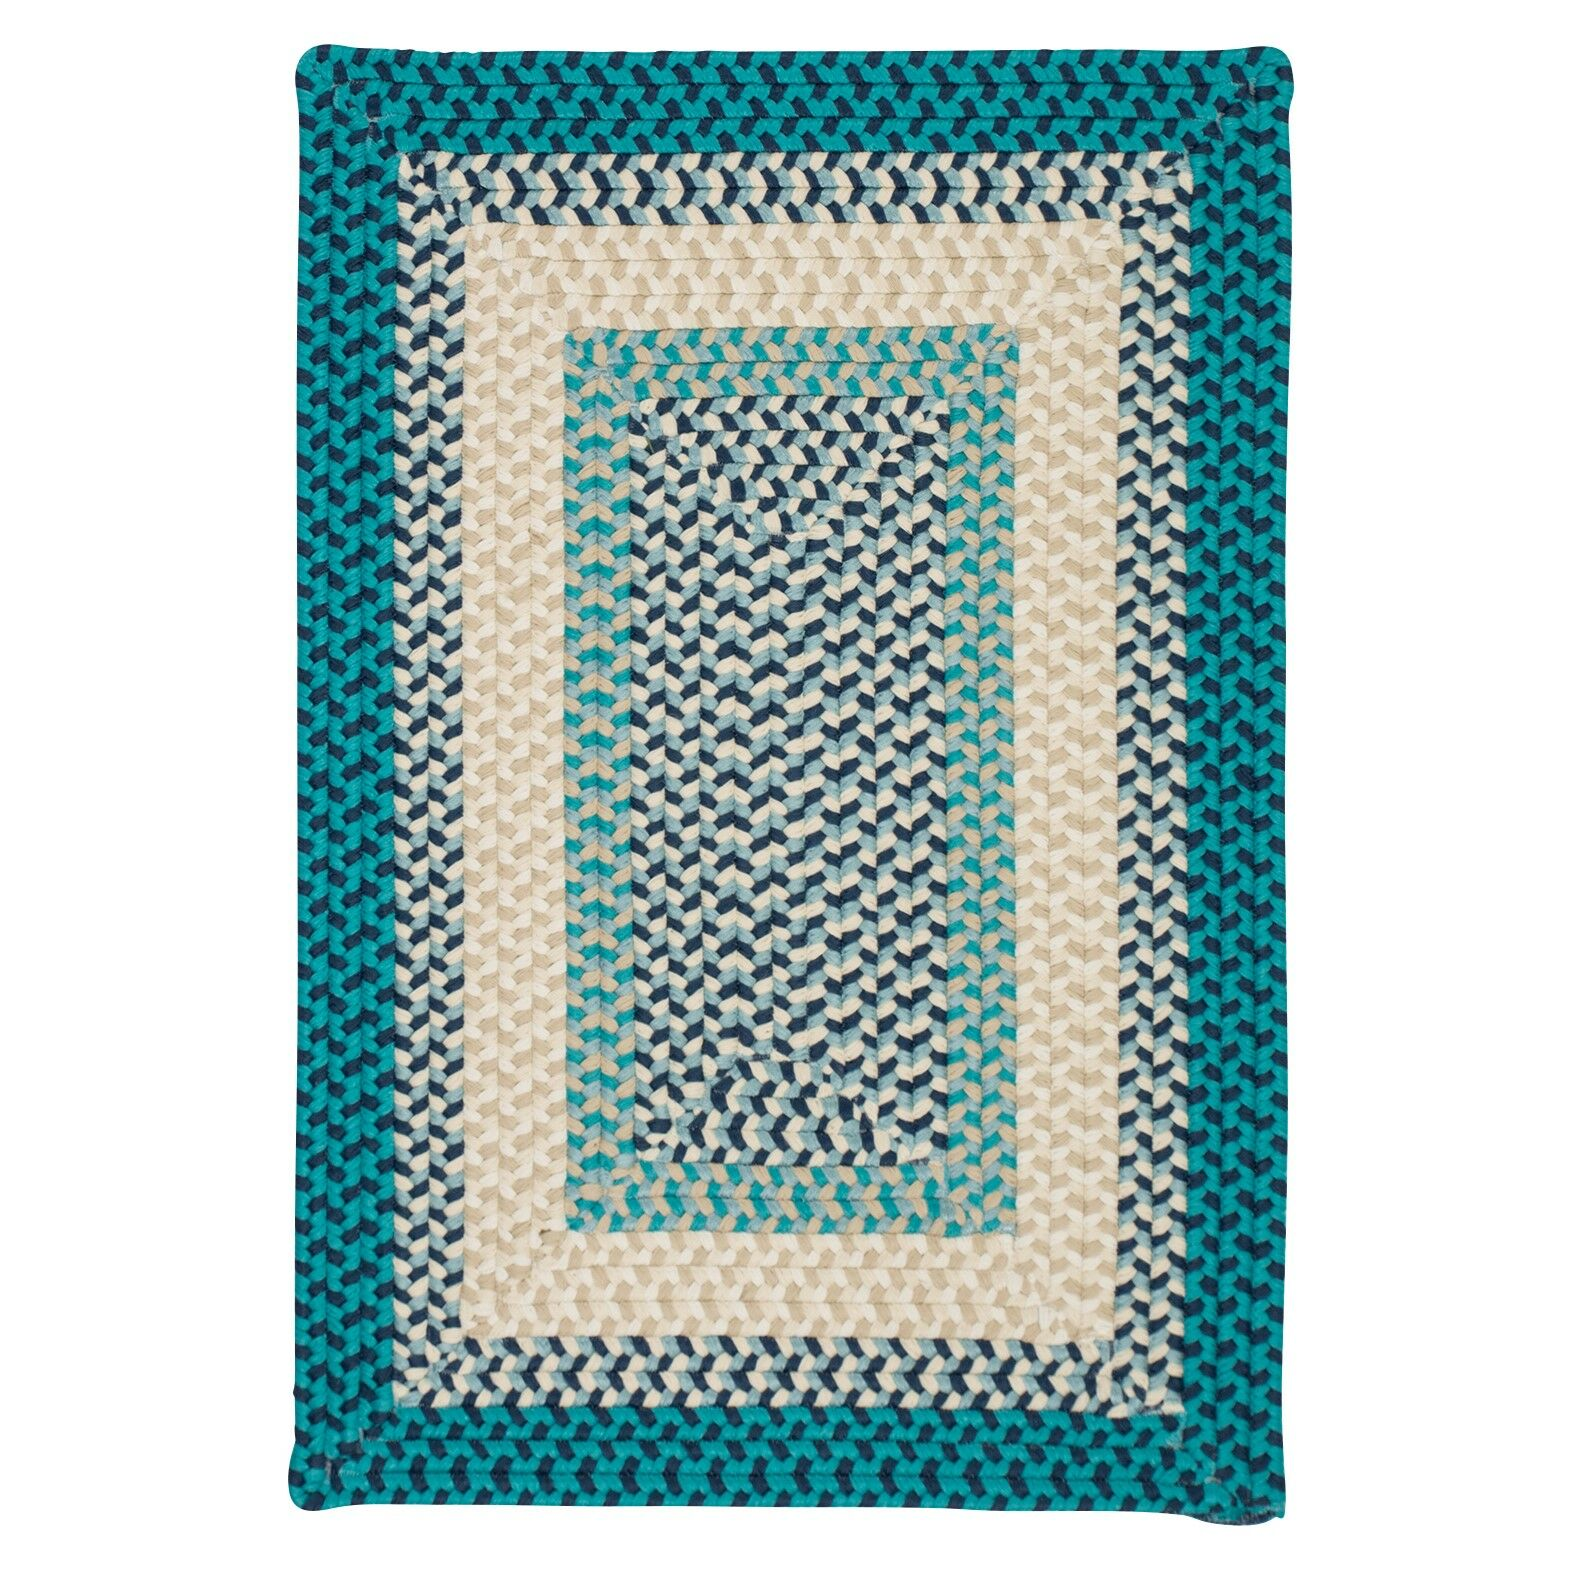 Marathovounos Hand-Woven Wool Blue Area Rug Rug Size: Rectangle 3' x 5'